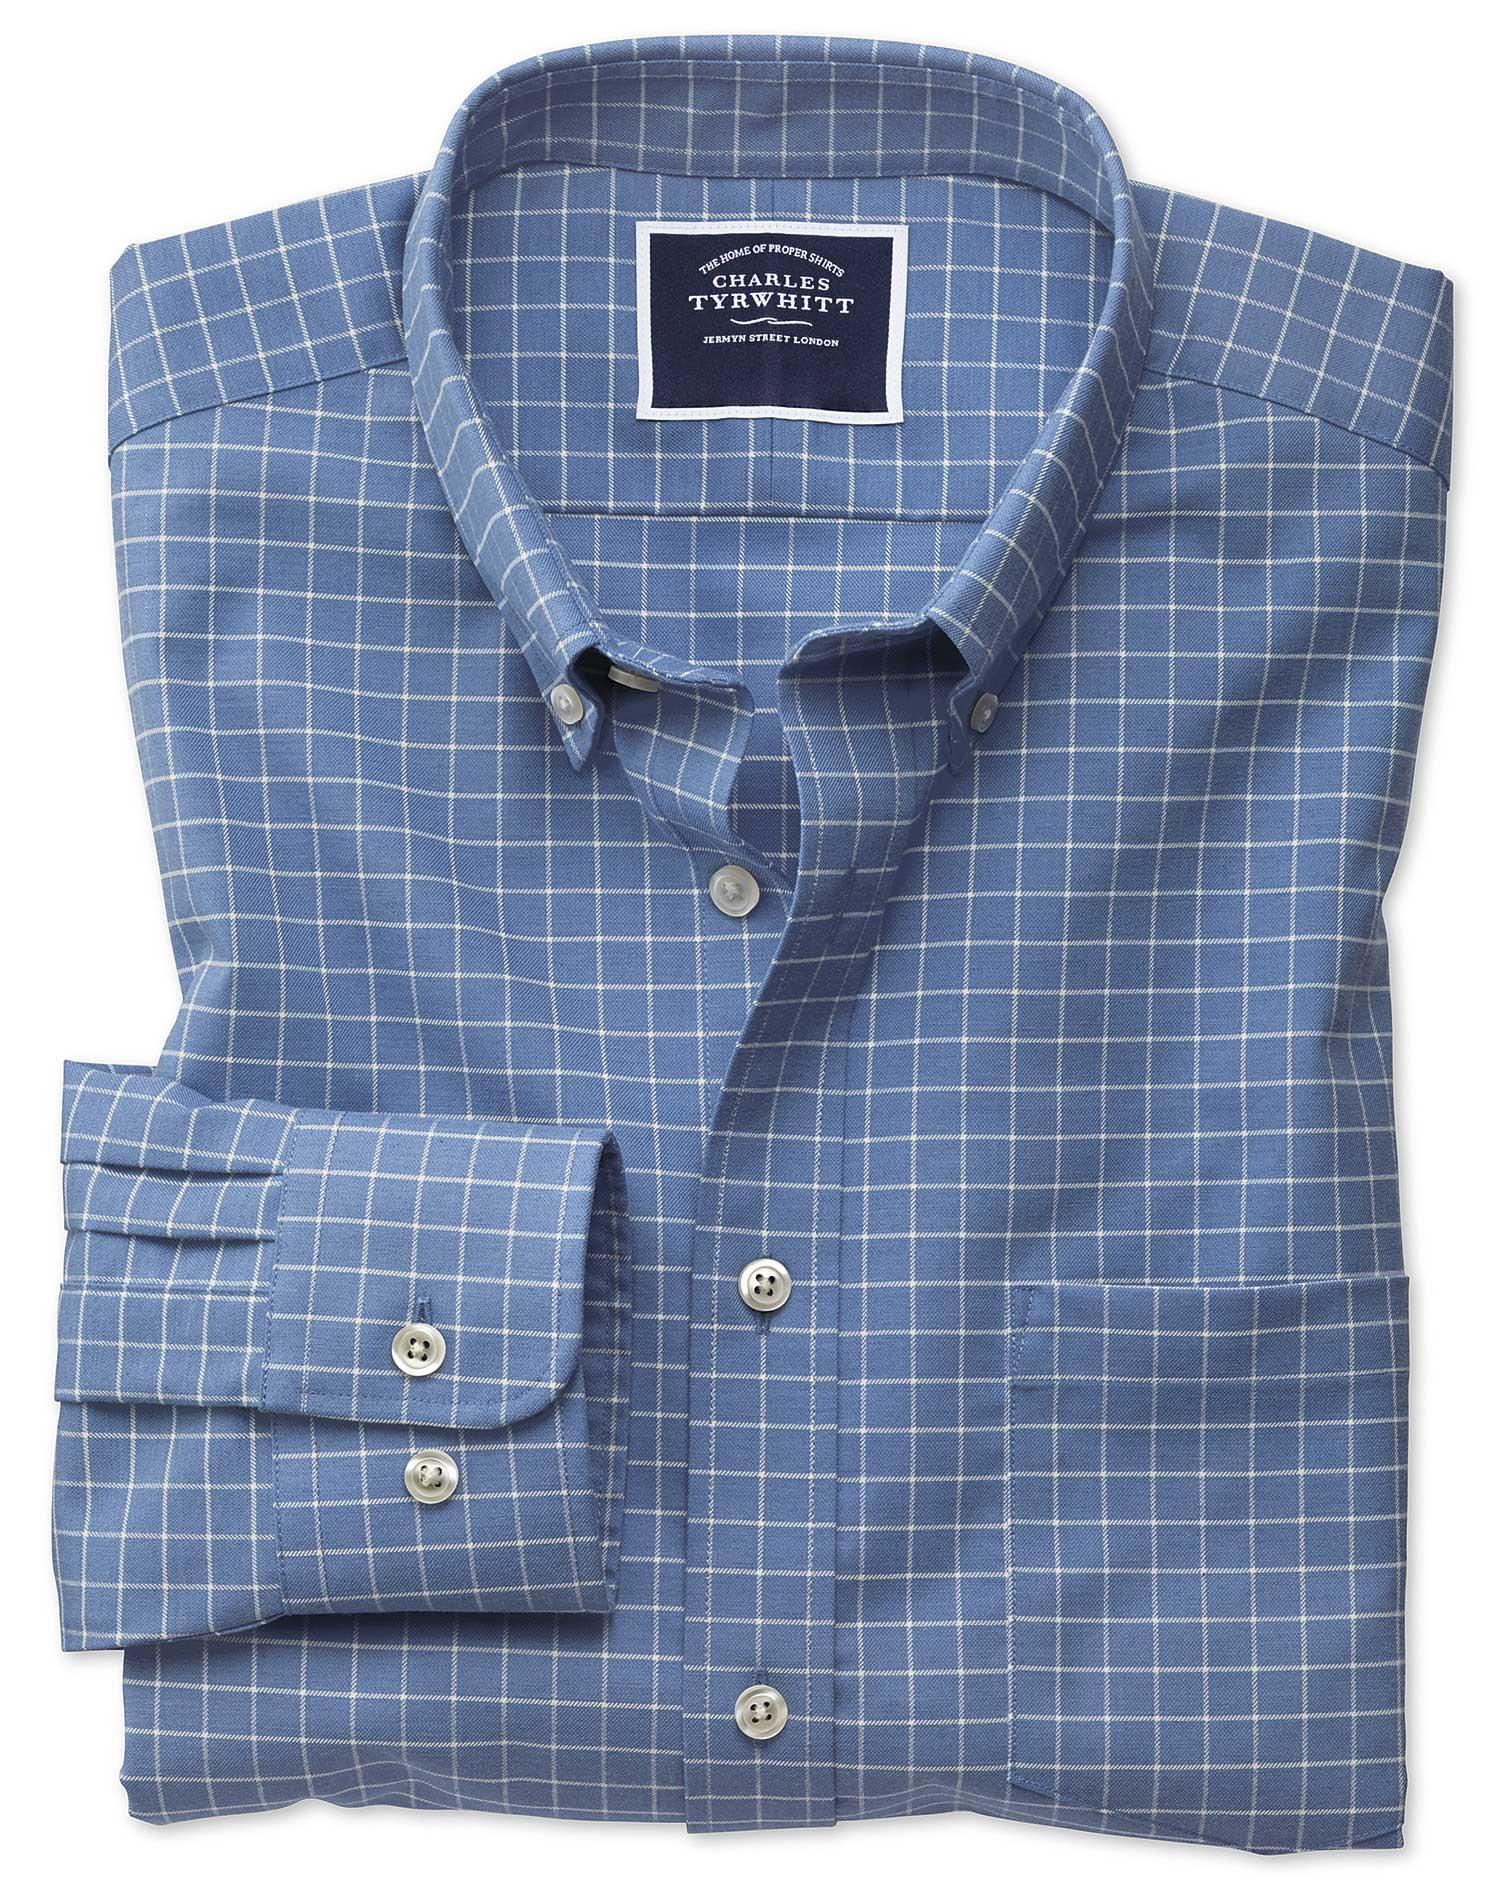 Slim Fit Non-Iron Sky Blue Grid Check Twill Cotton Shirt Single Cuff Size XL by Charles Tyrwhitt